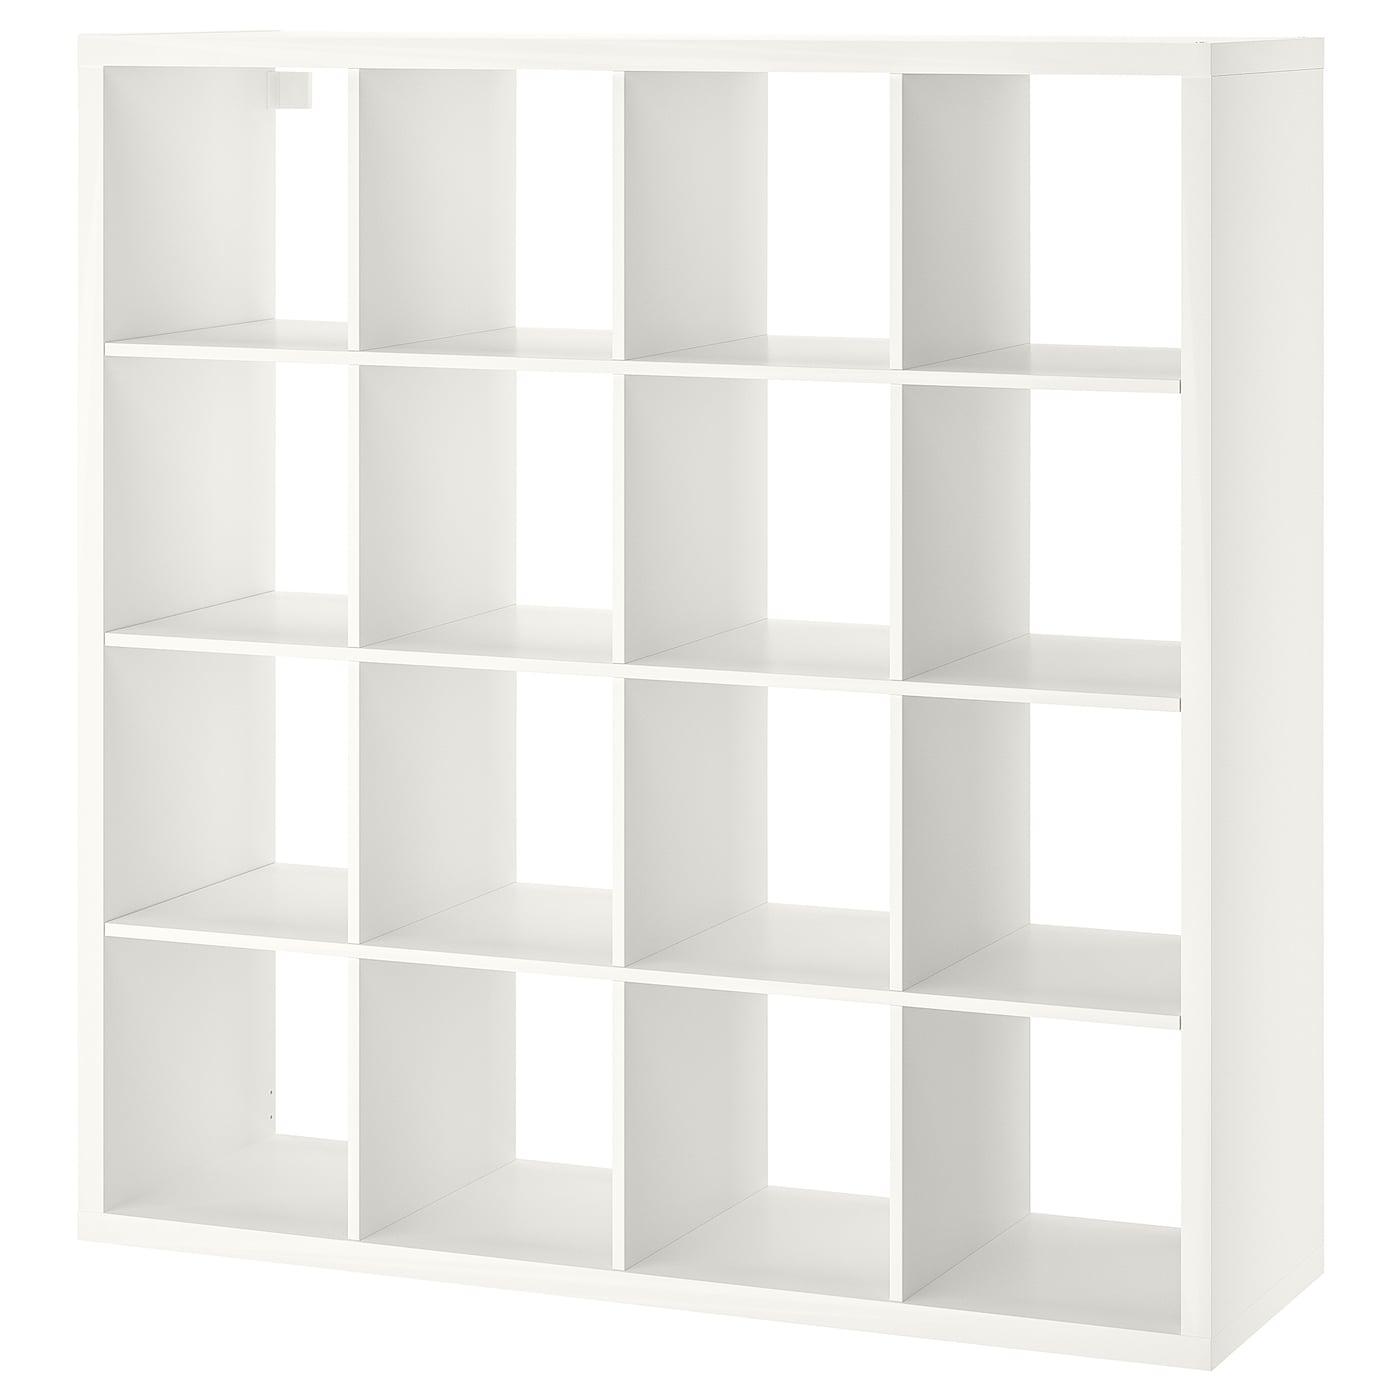 Estanter�a, blanco, 147x147 cm